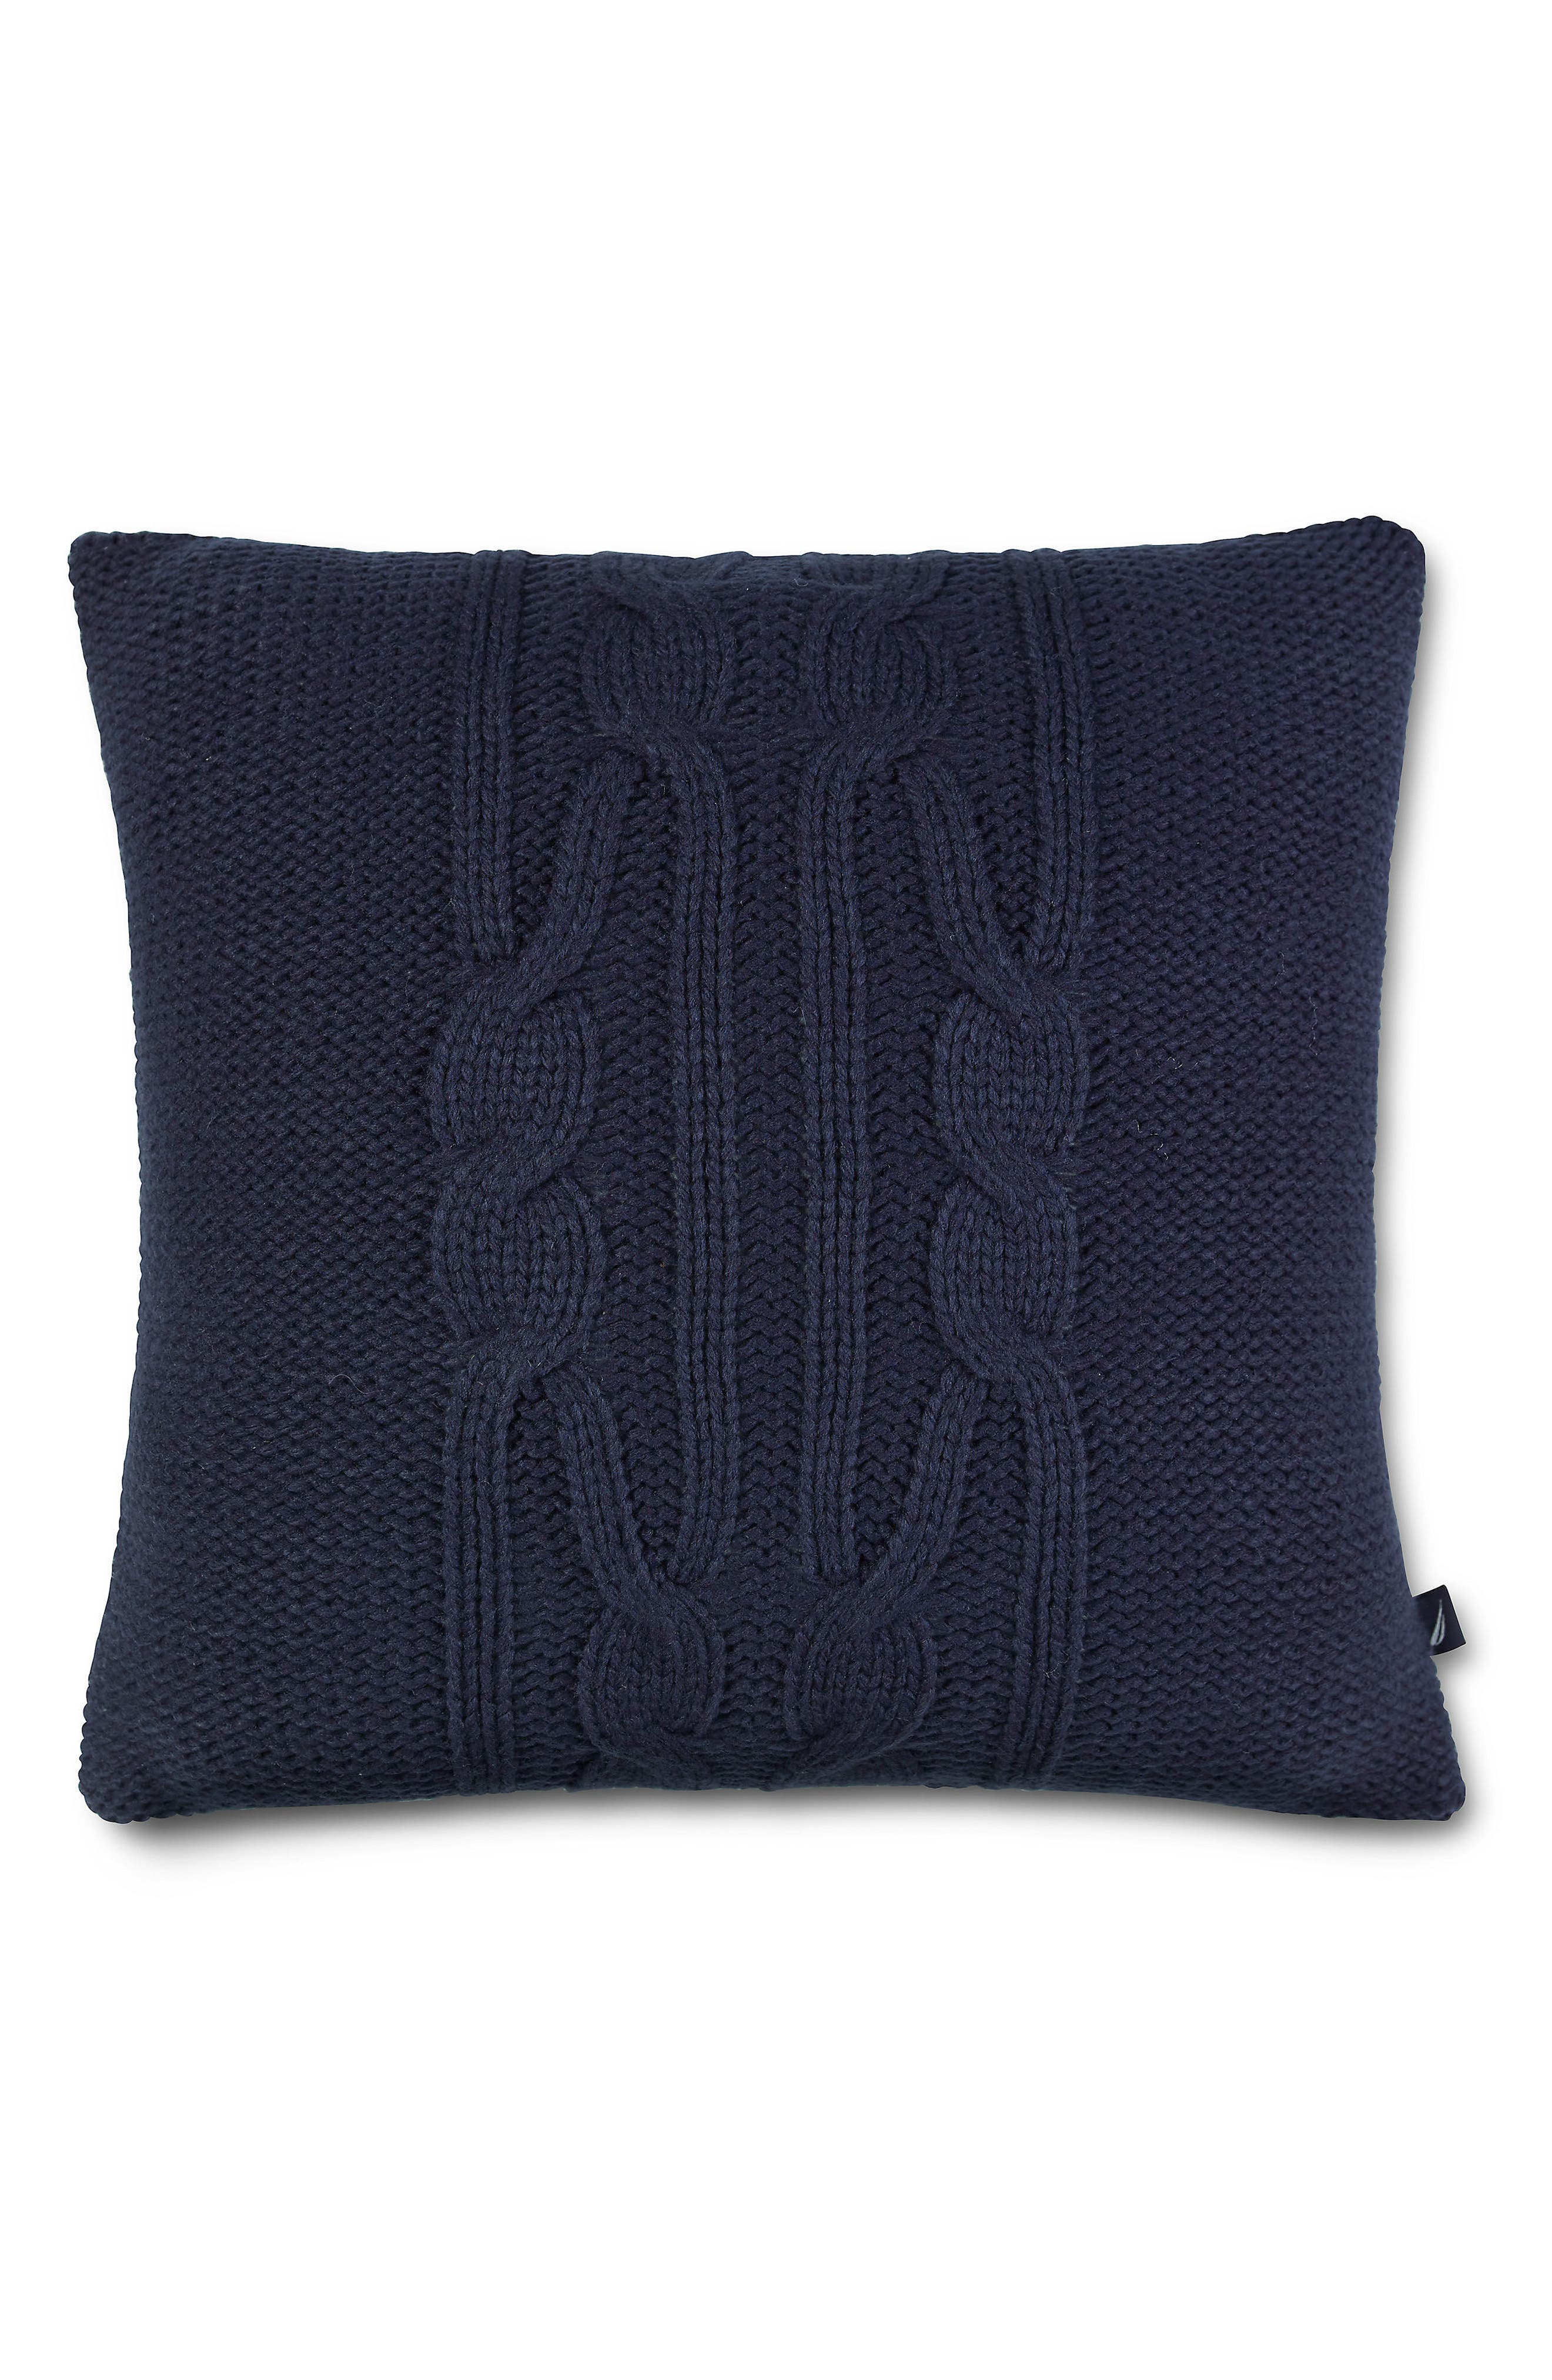 Bartlett Knit Pillow,                         Main,                         color, Navy